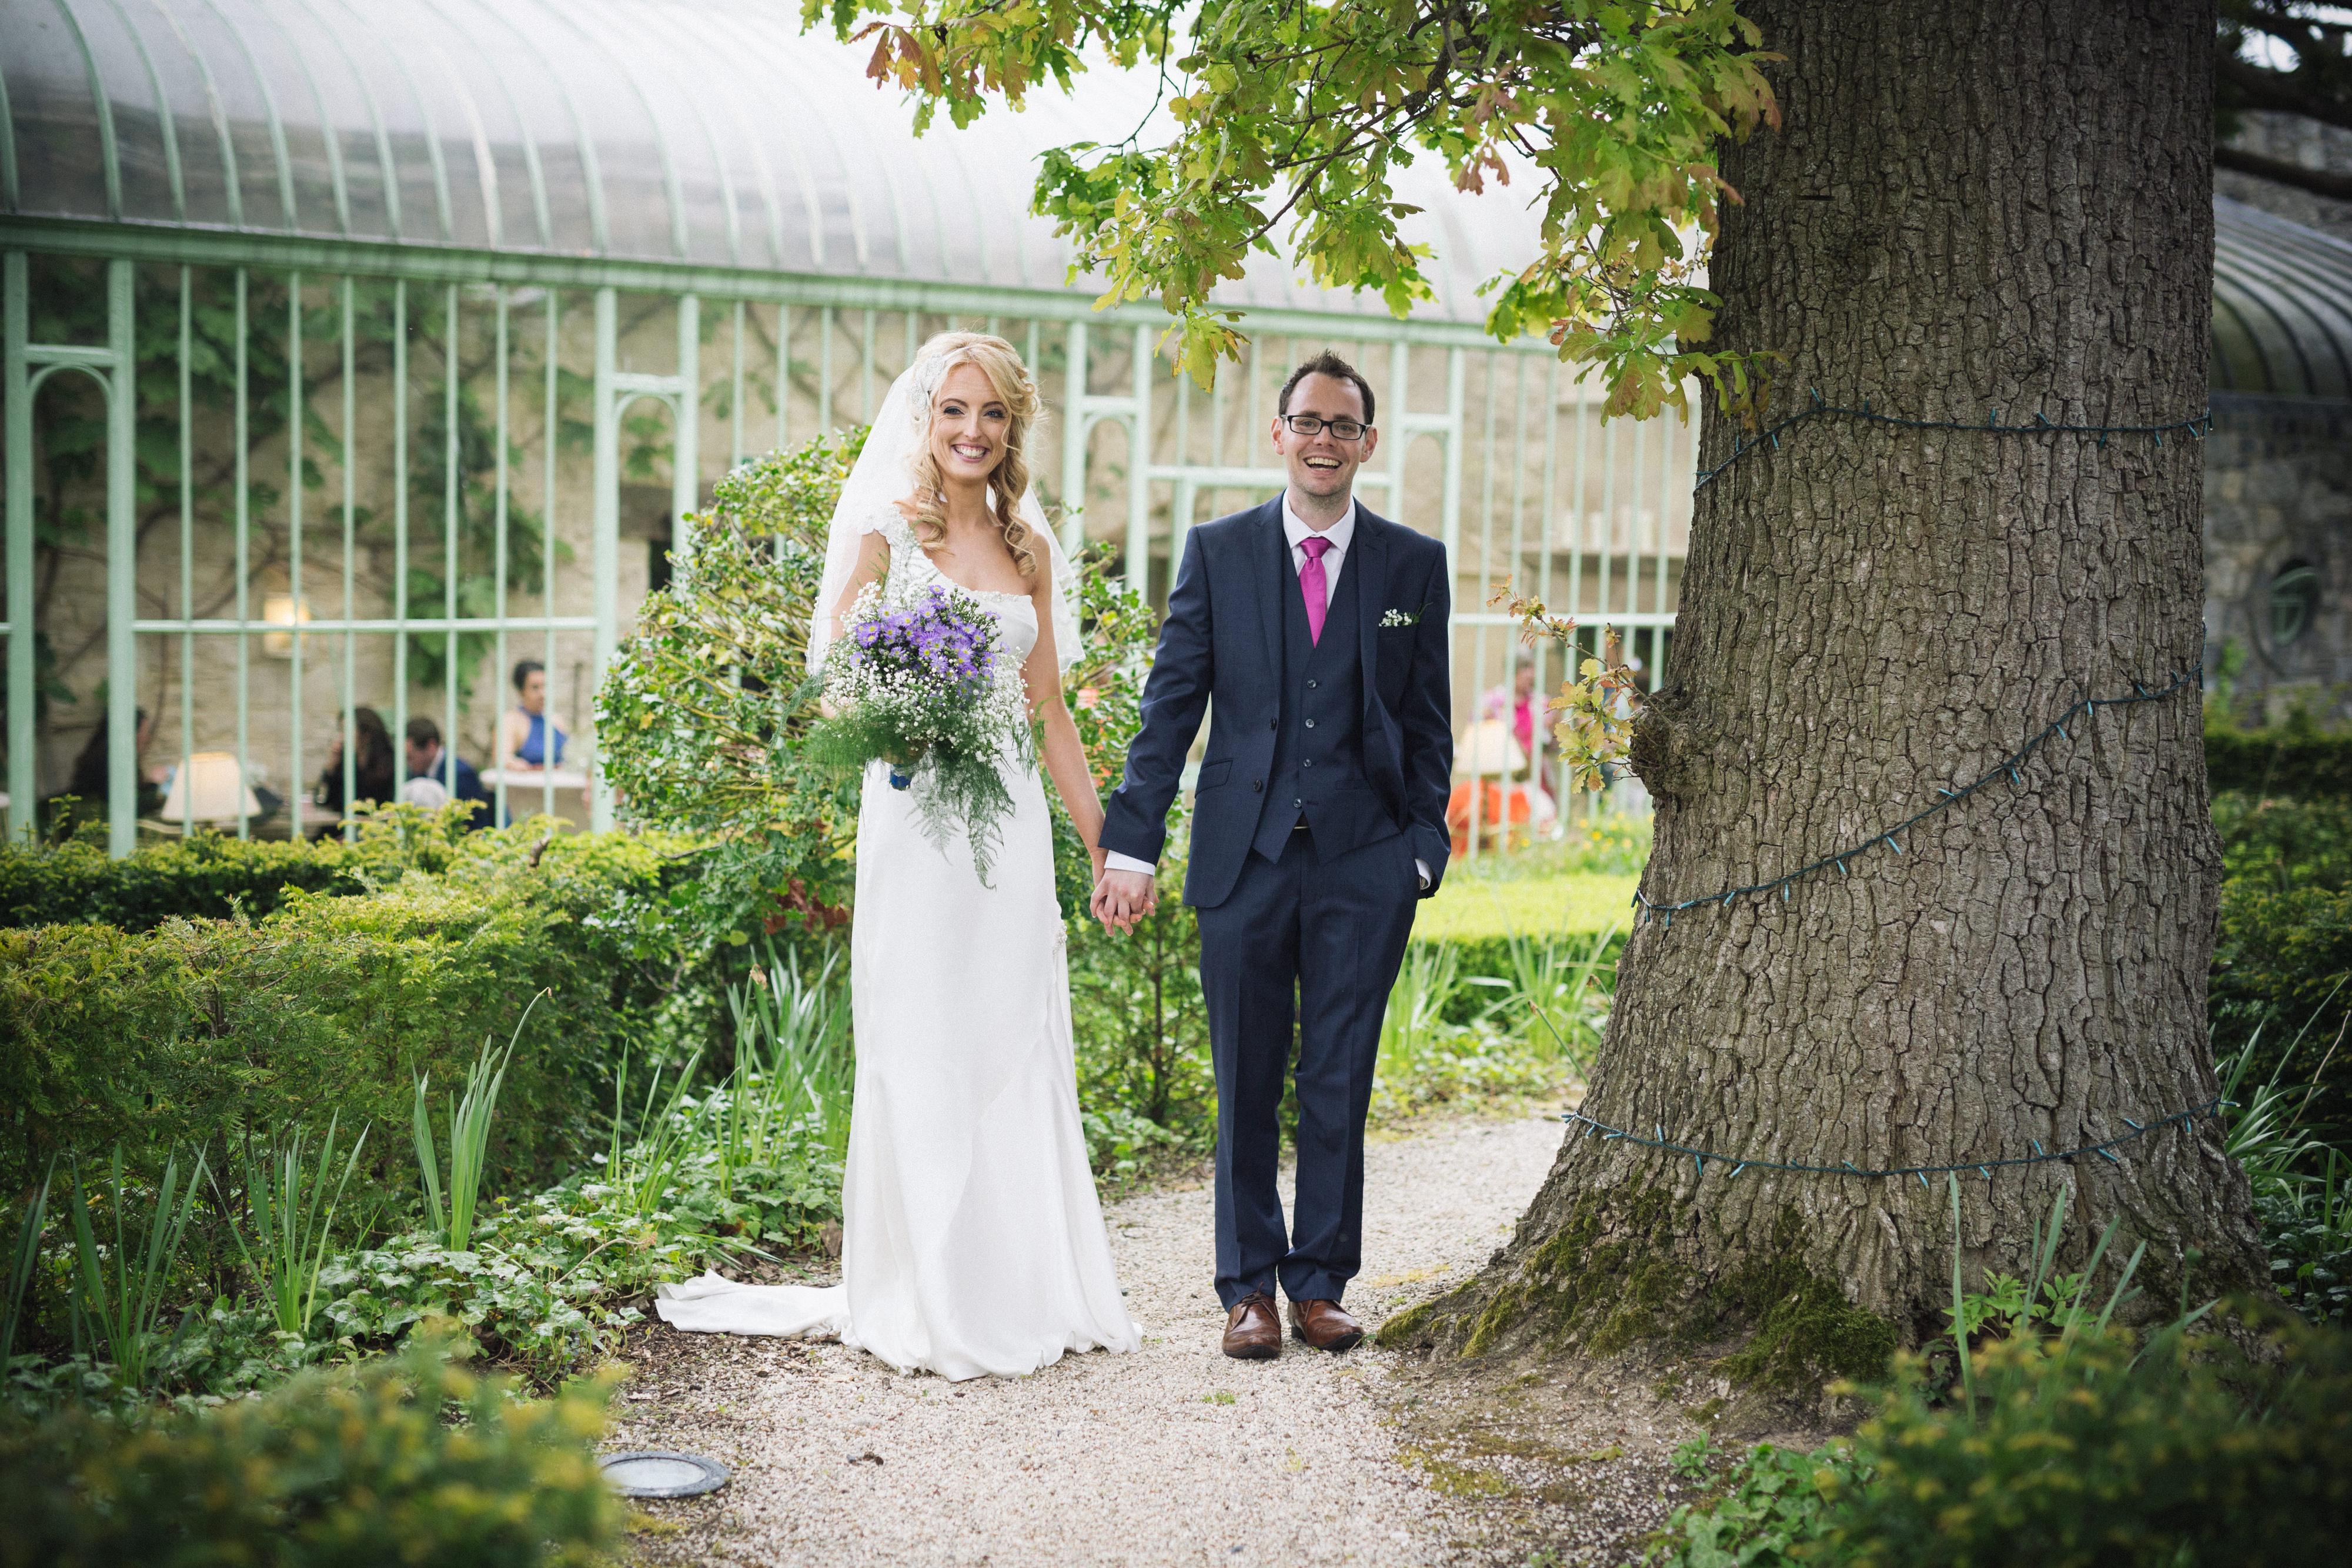 Cliff_at_Lyons_wedding_photos